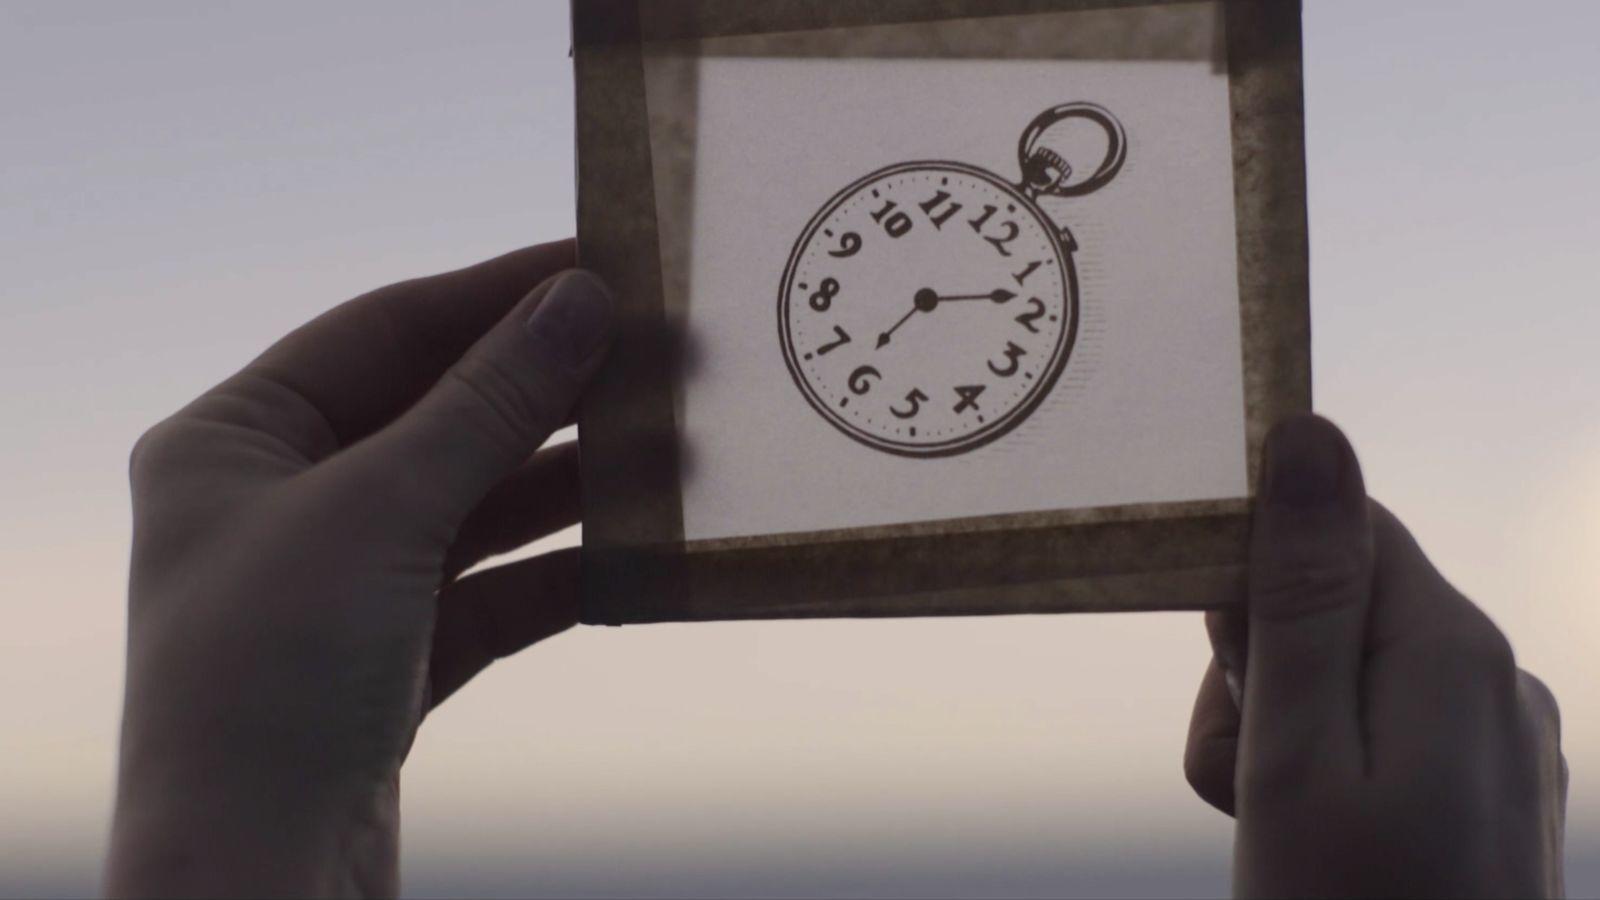 Roberto Bado Reminds Us To Take Our Time